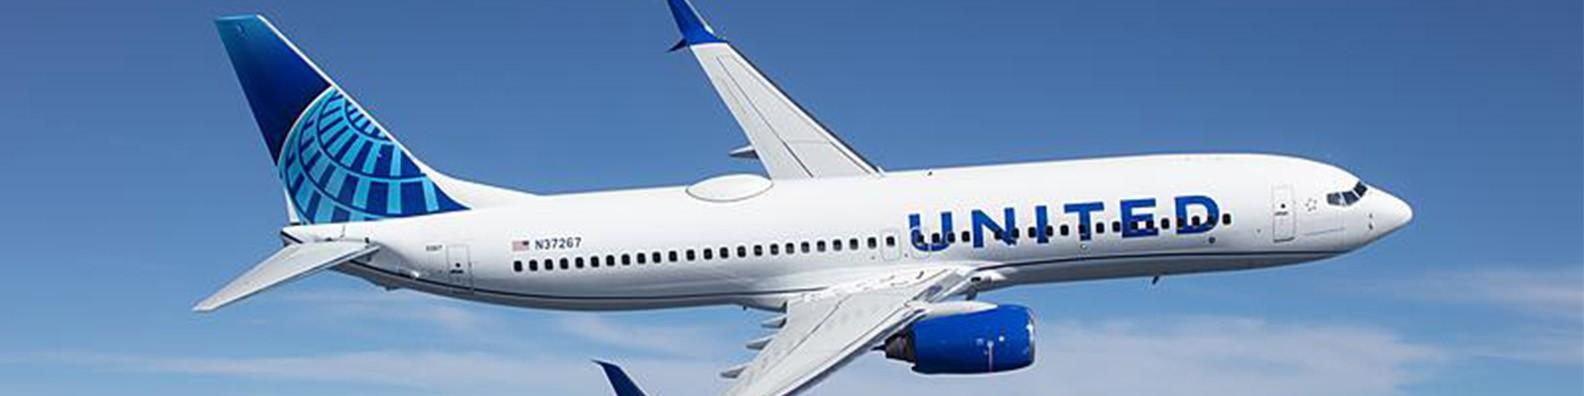 United Airlines | LinkedIn